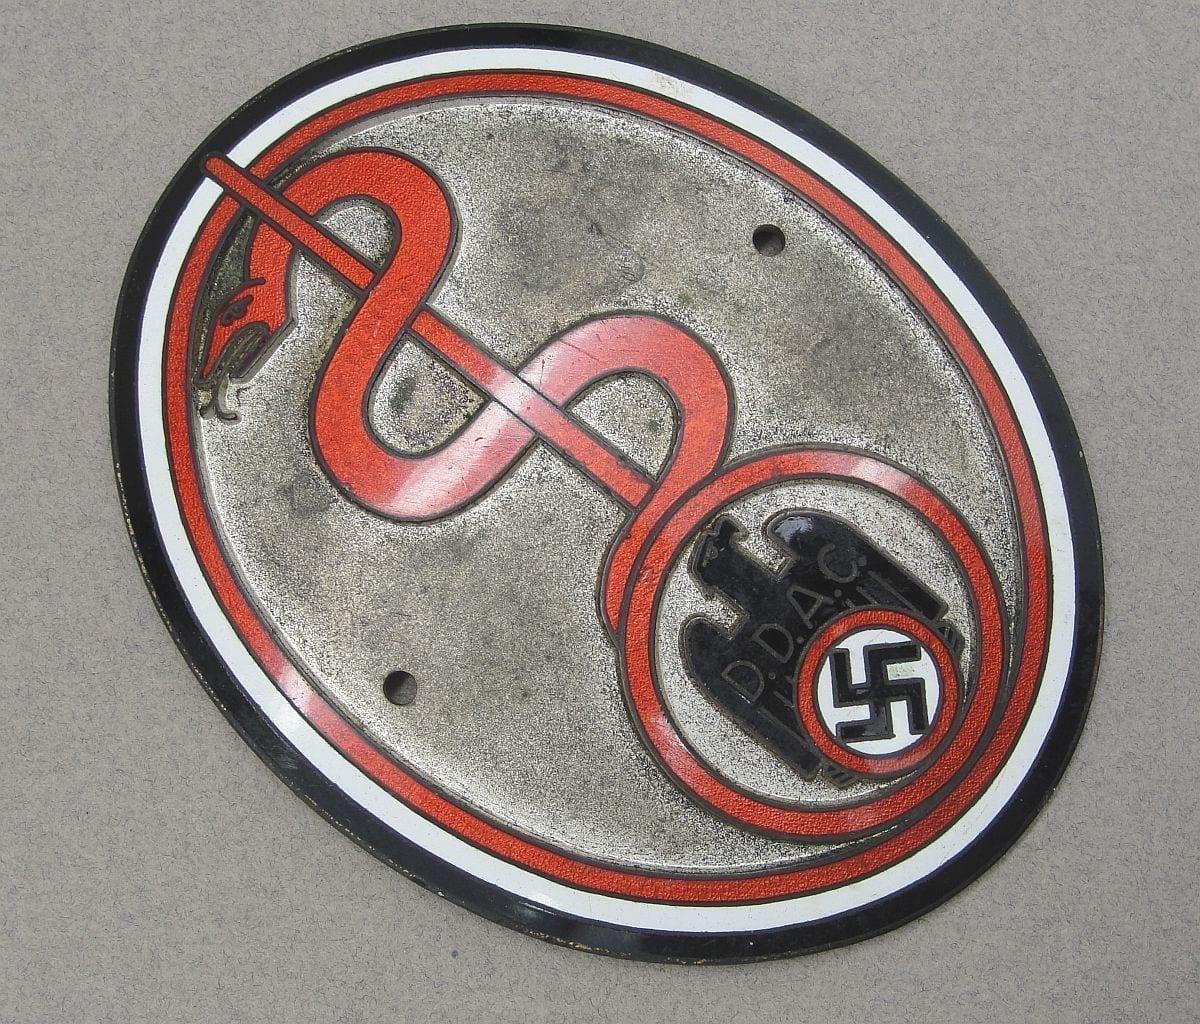 DDAC German Automobile Club Radiator Plaque for Physicians